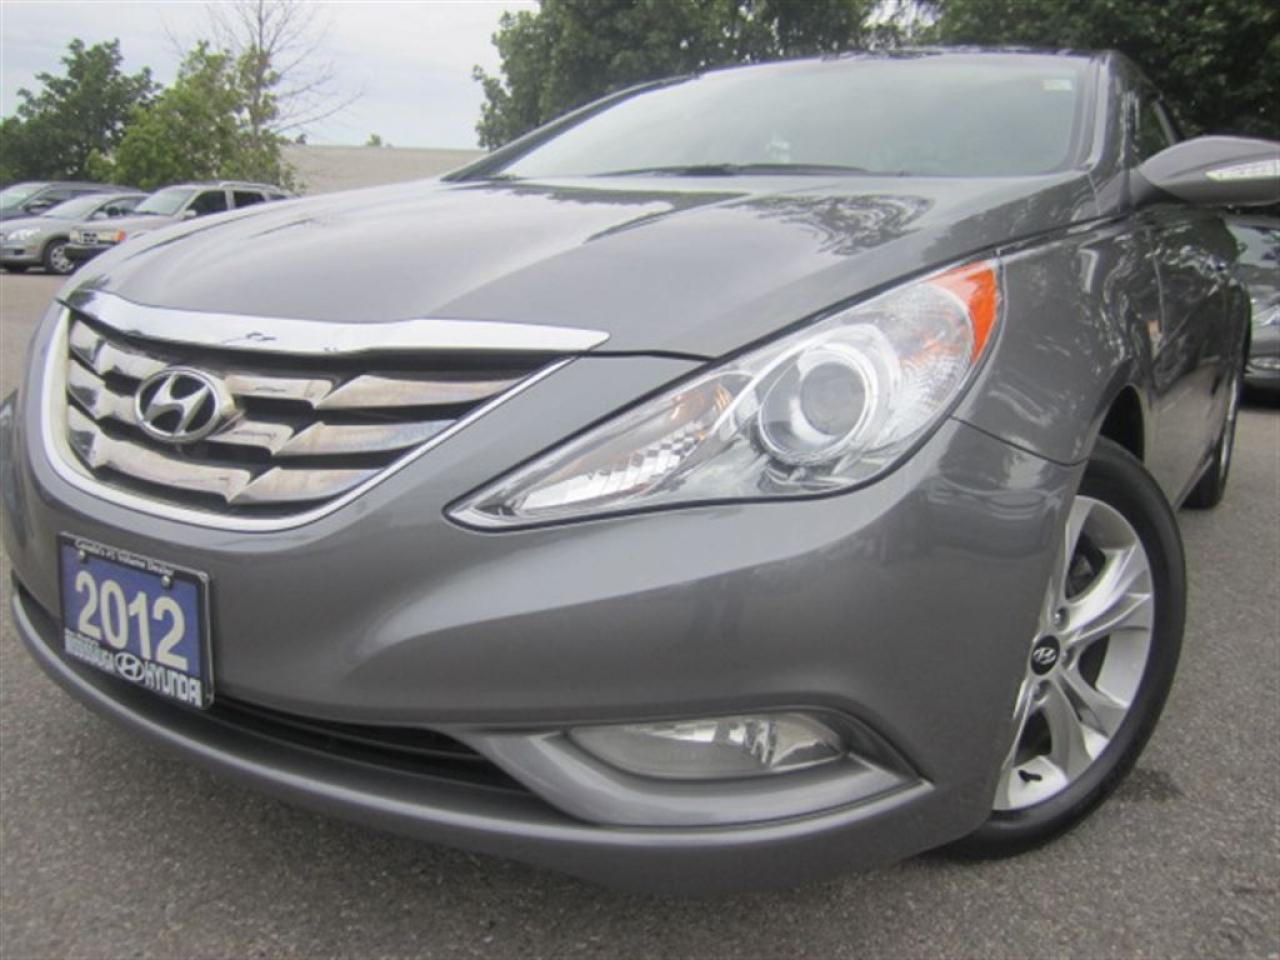 2012 Hyundai Sonata Limited-leather-sunroof-NEW tires